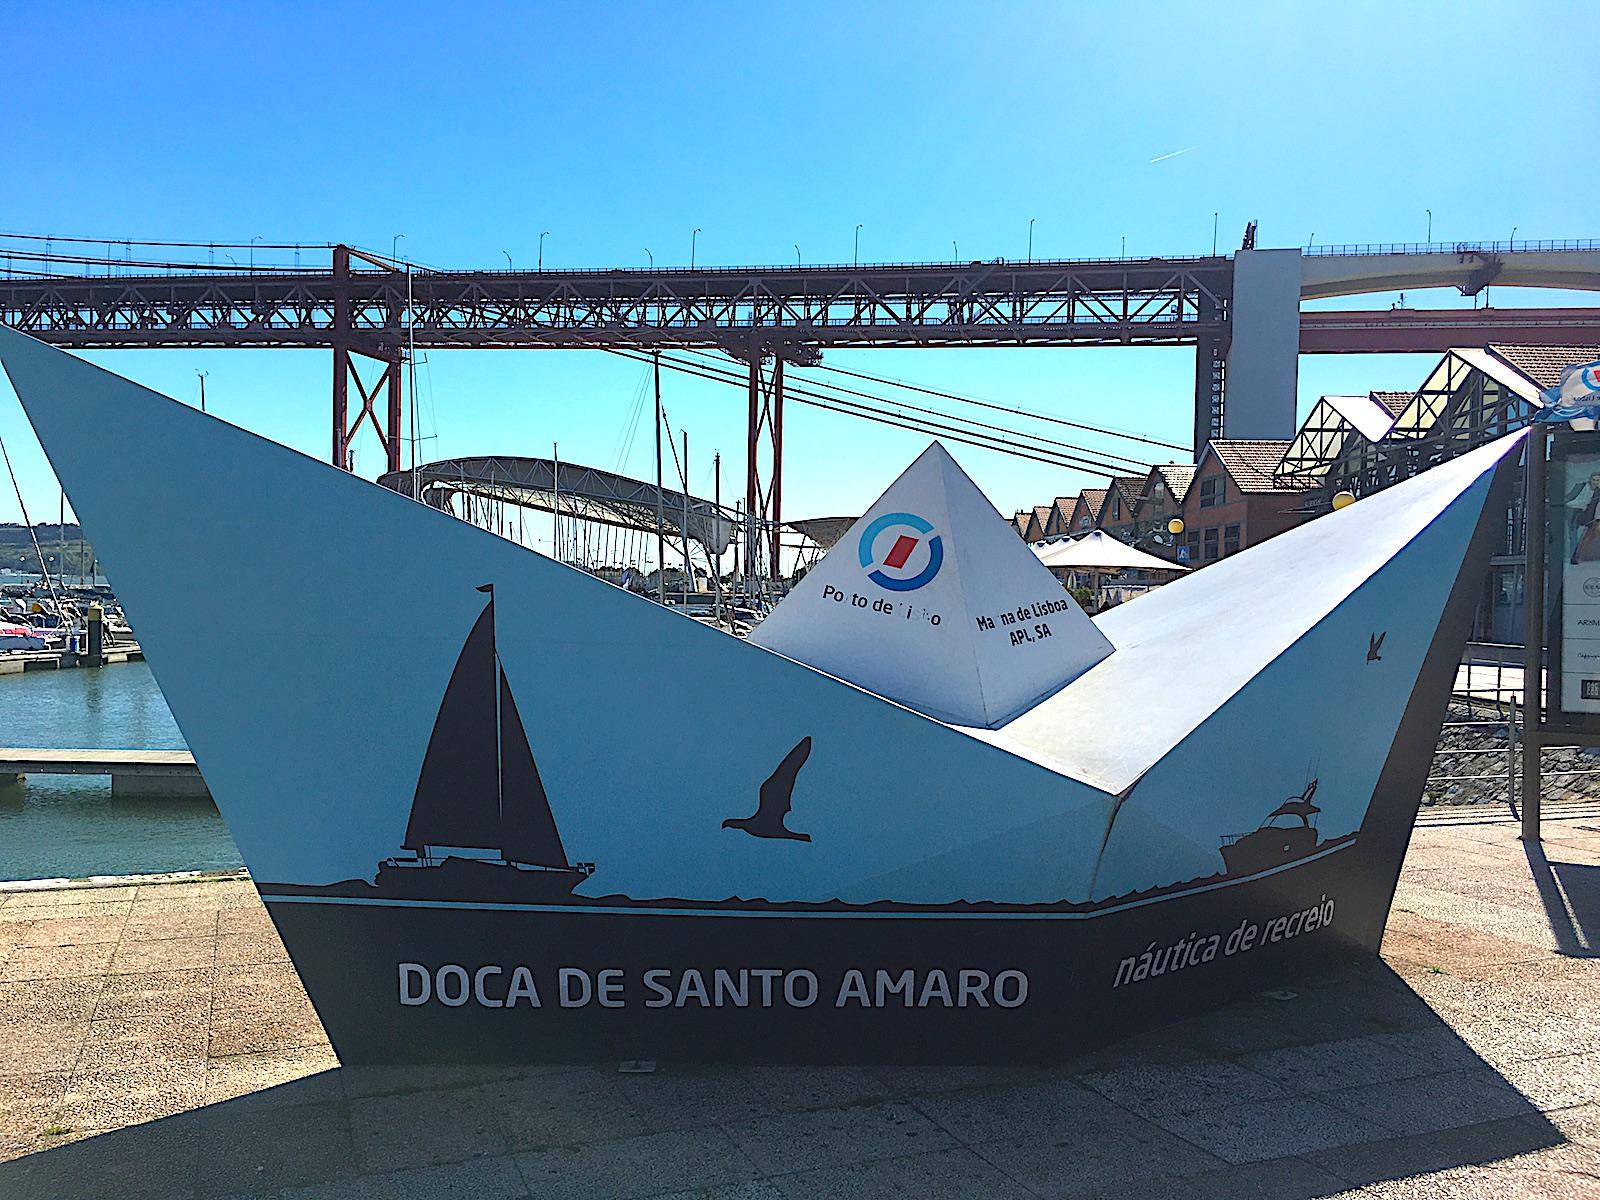 Docadesantoamoro boot bij ingang